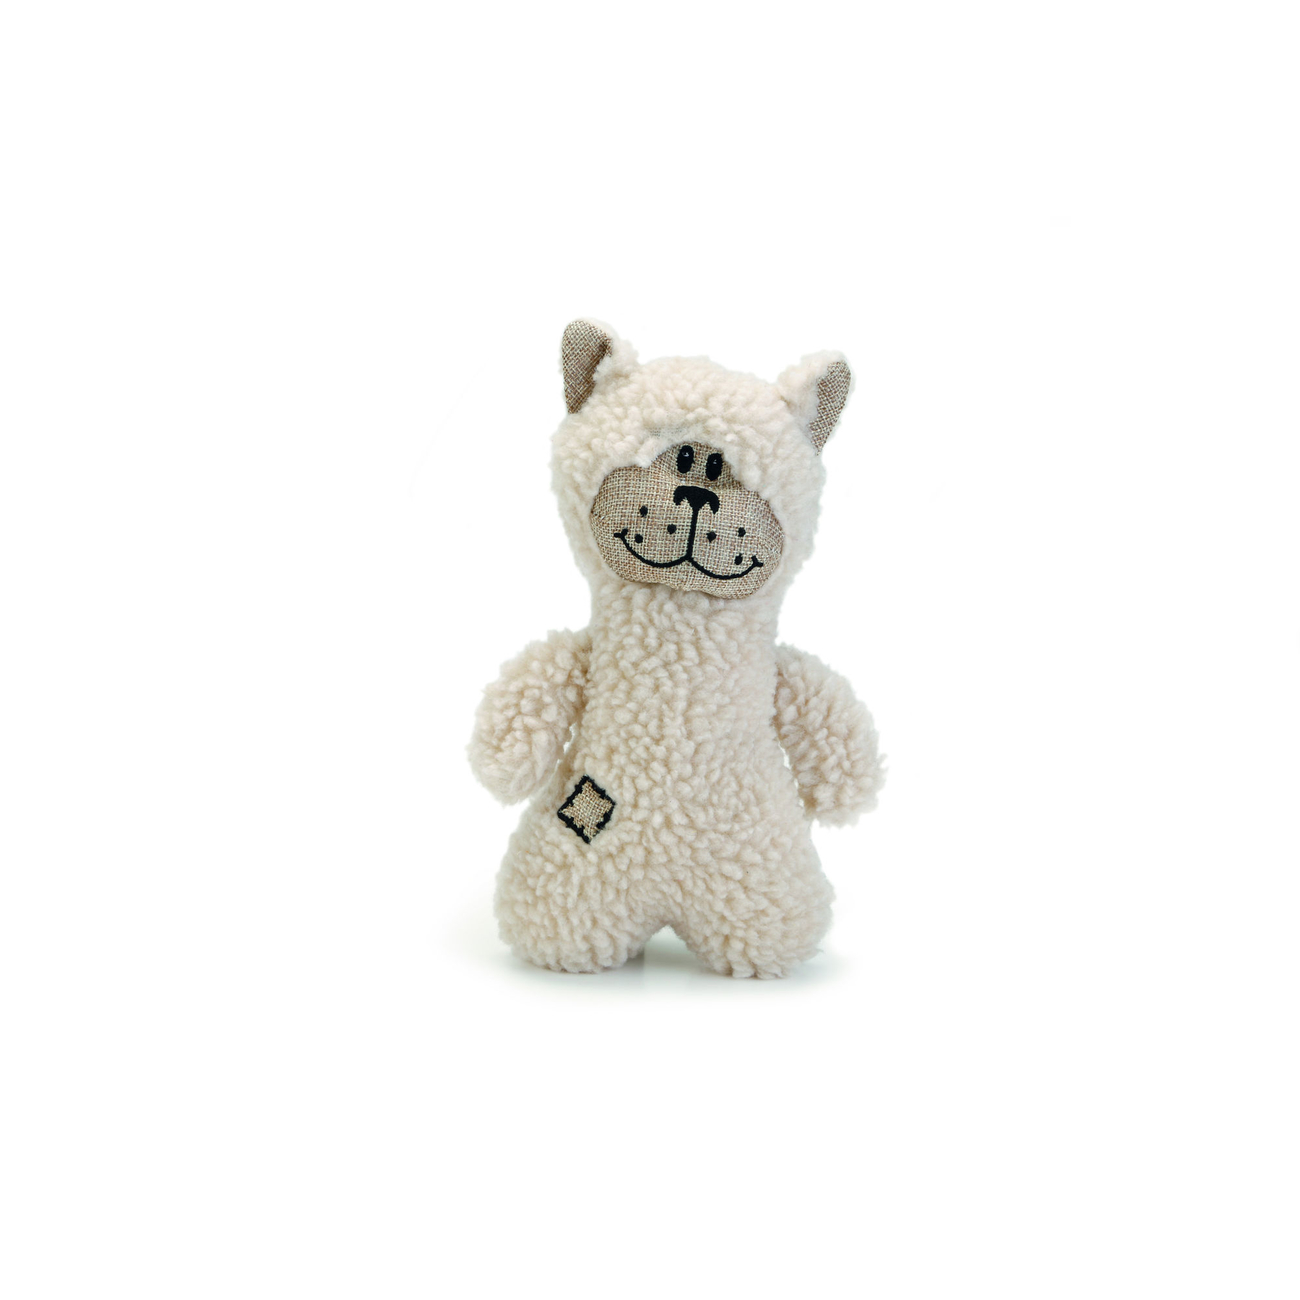 Beeztees Textil Knuddel Hundespielzeug, Bild 2